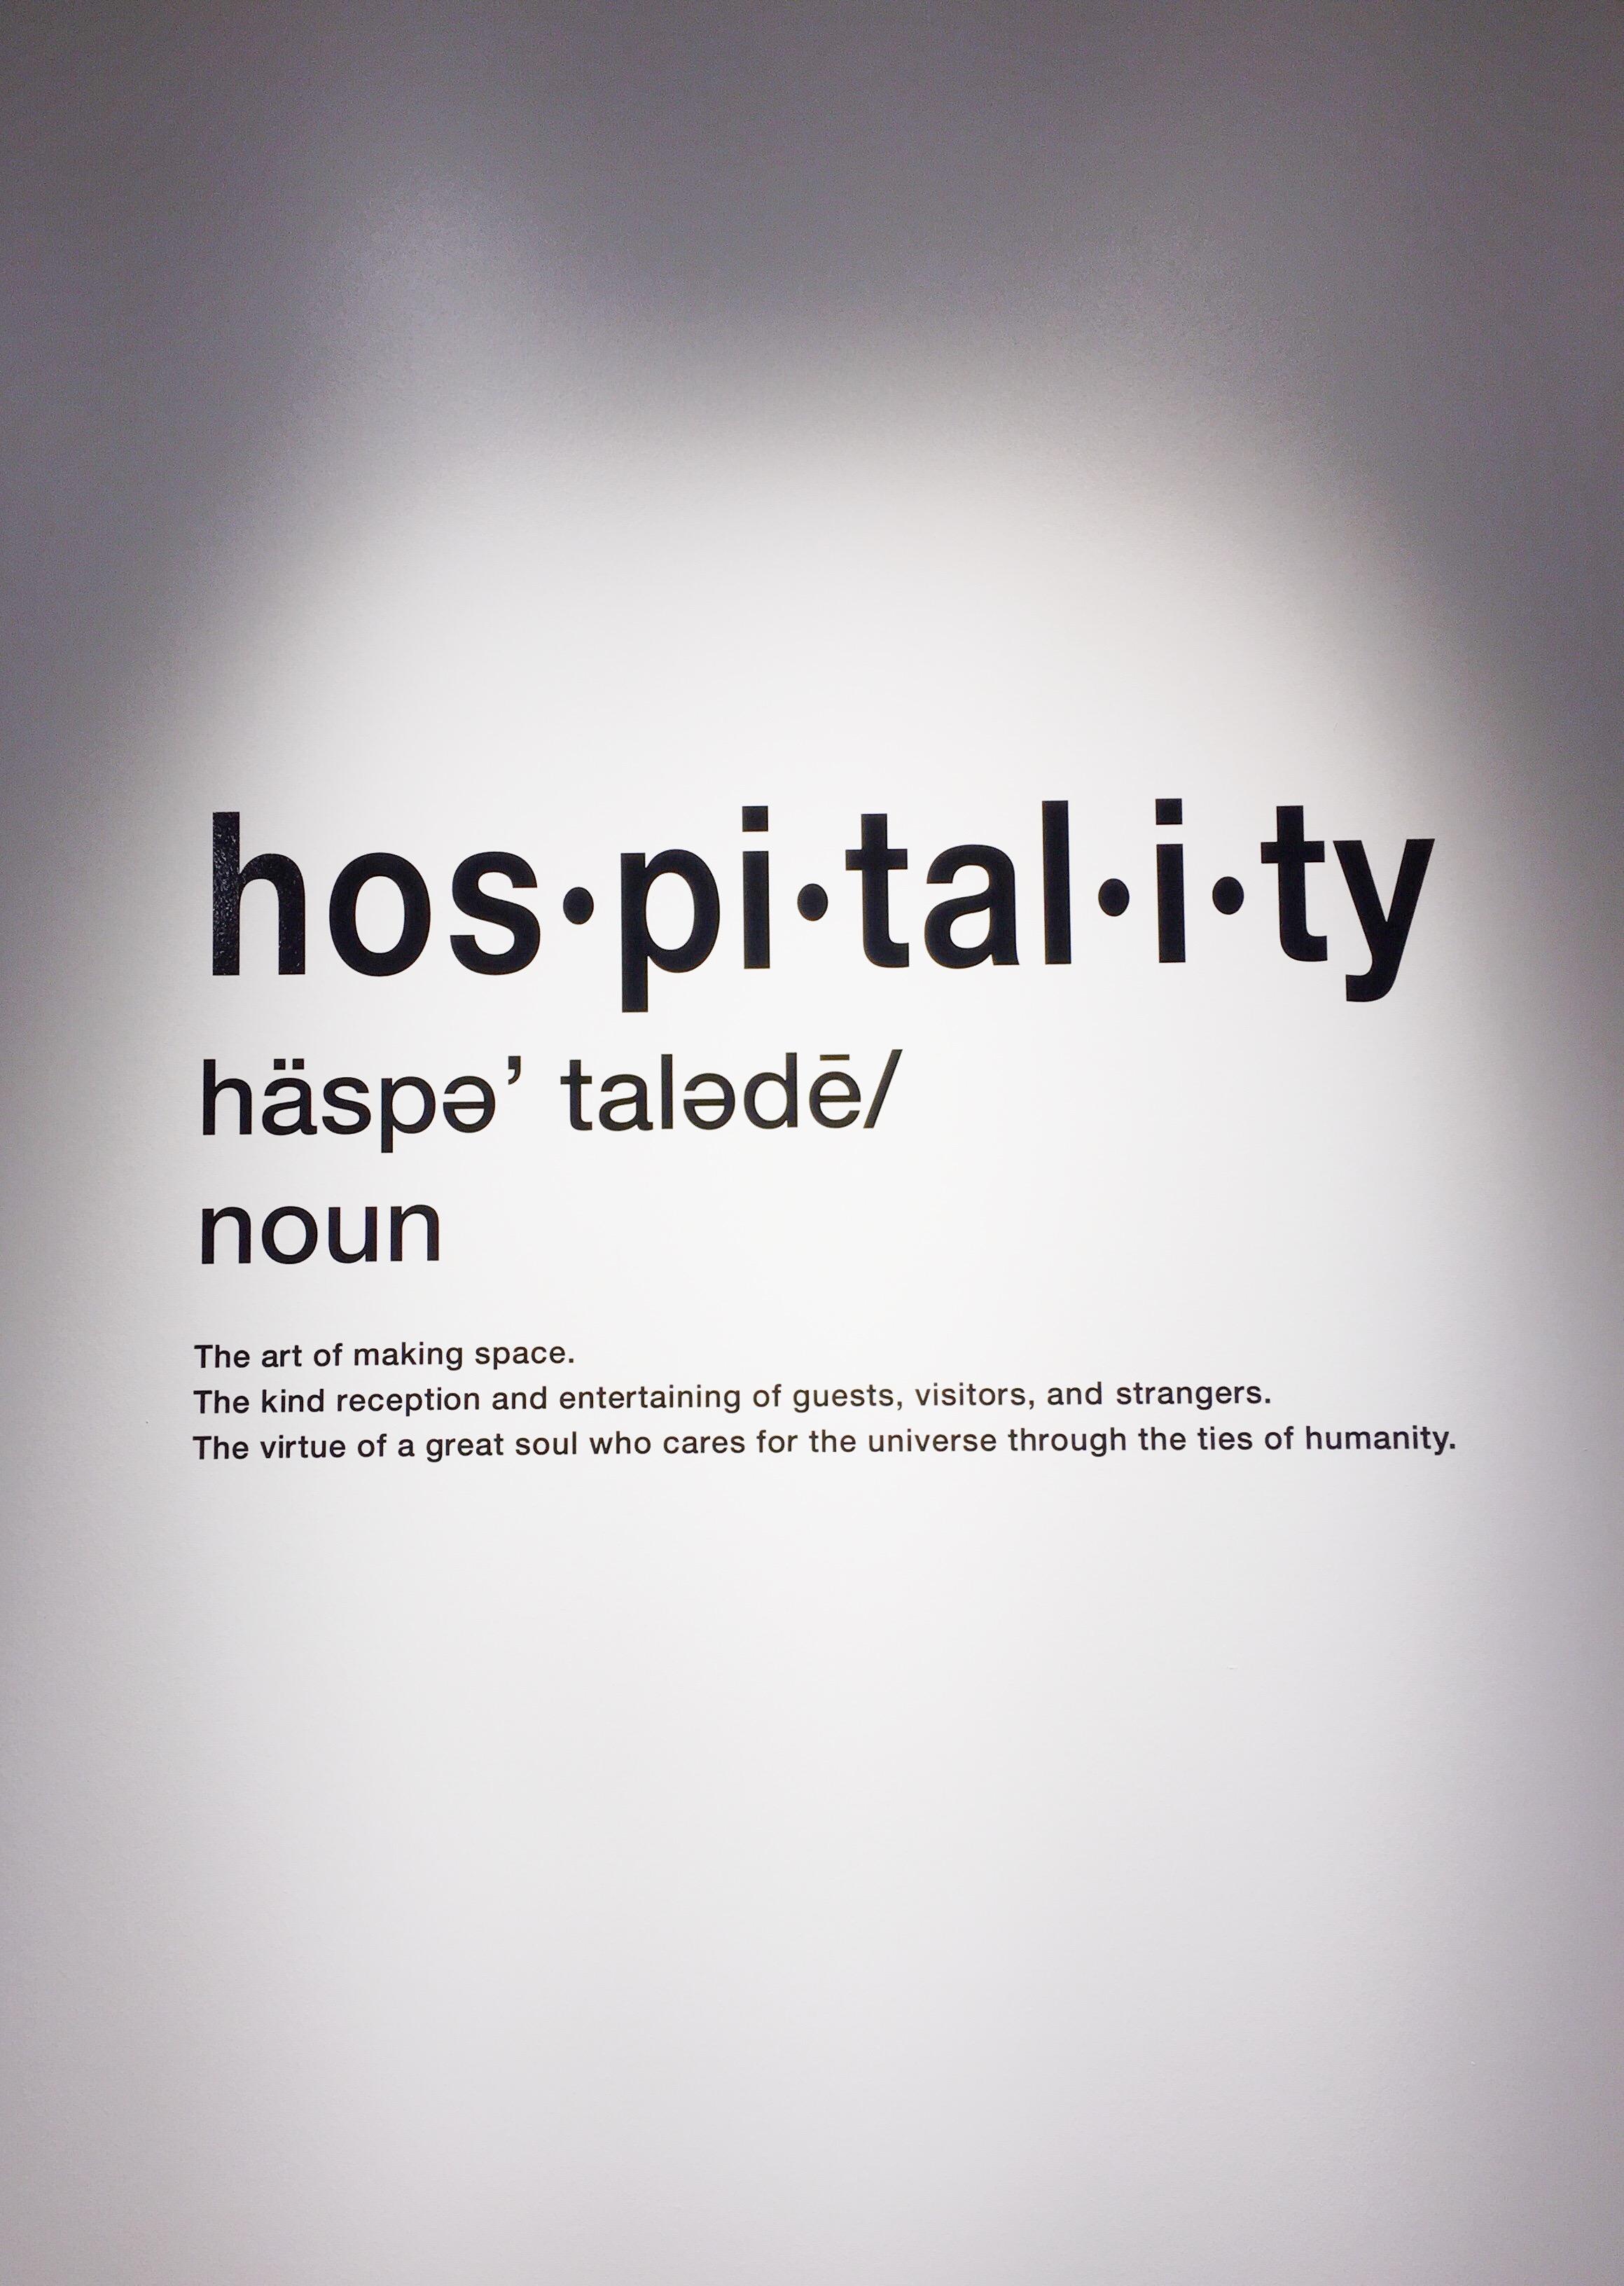 hospitality-sign.jpg